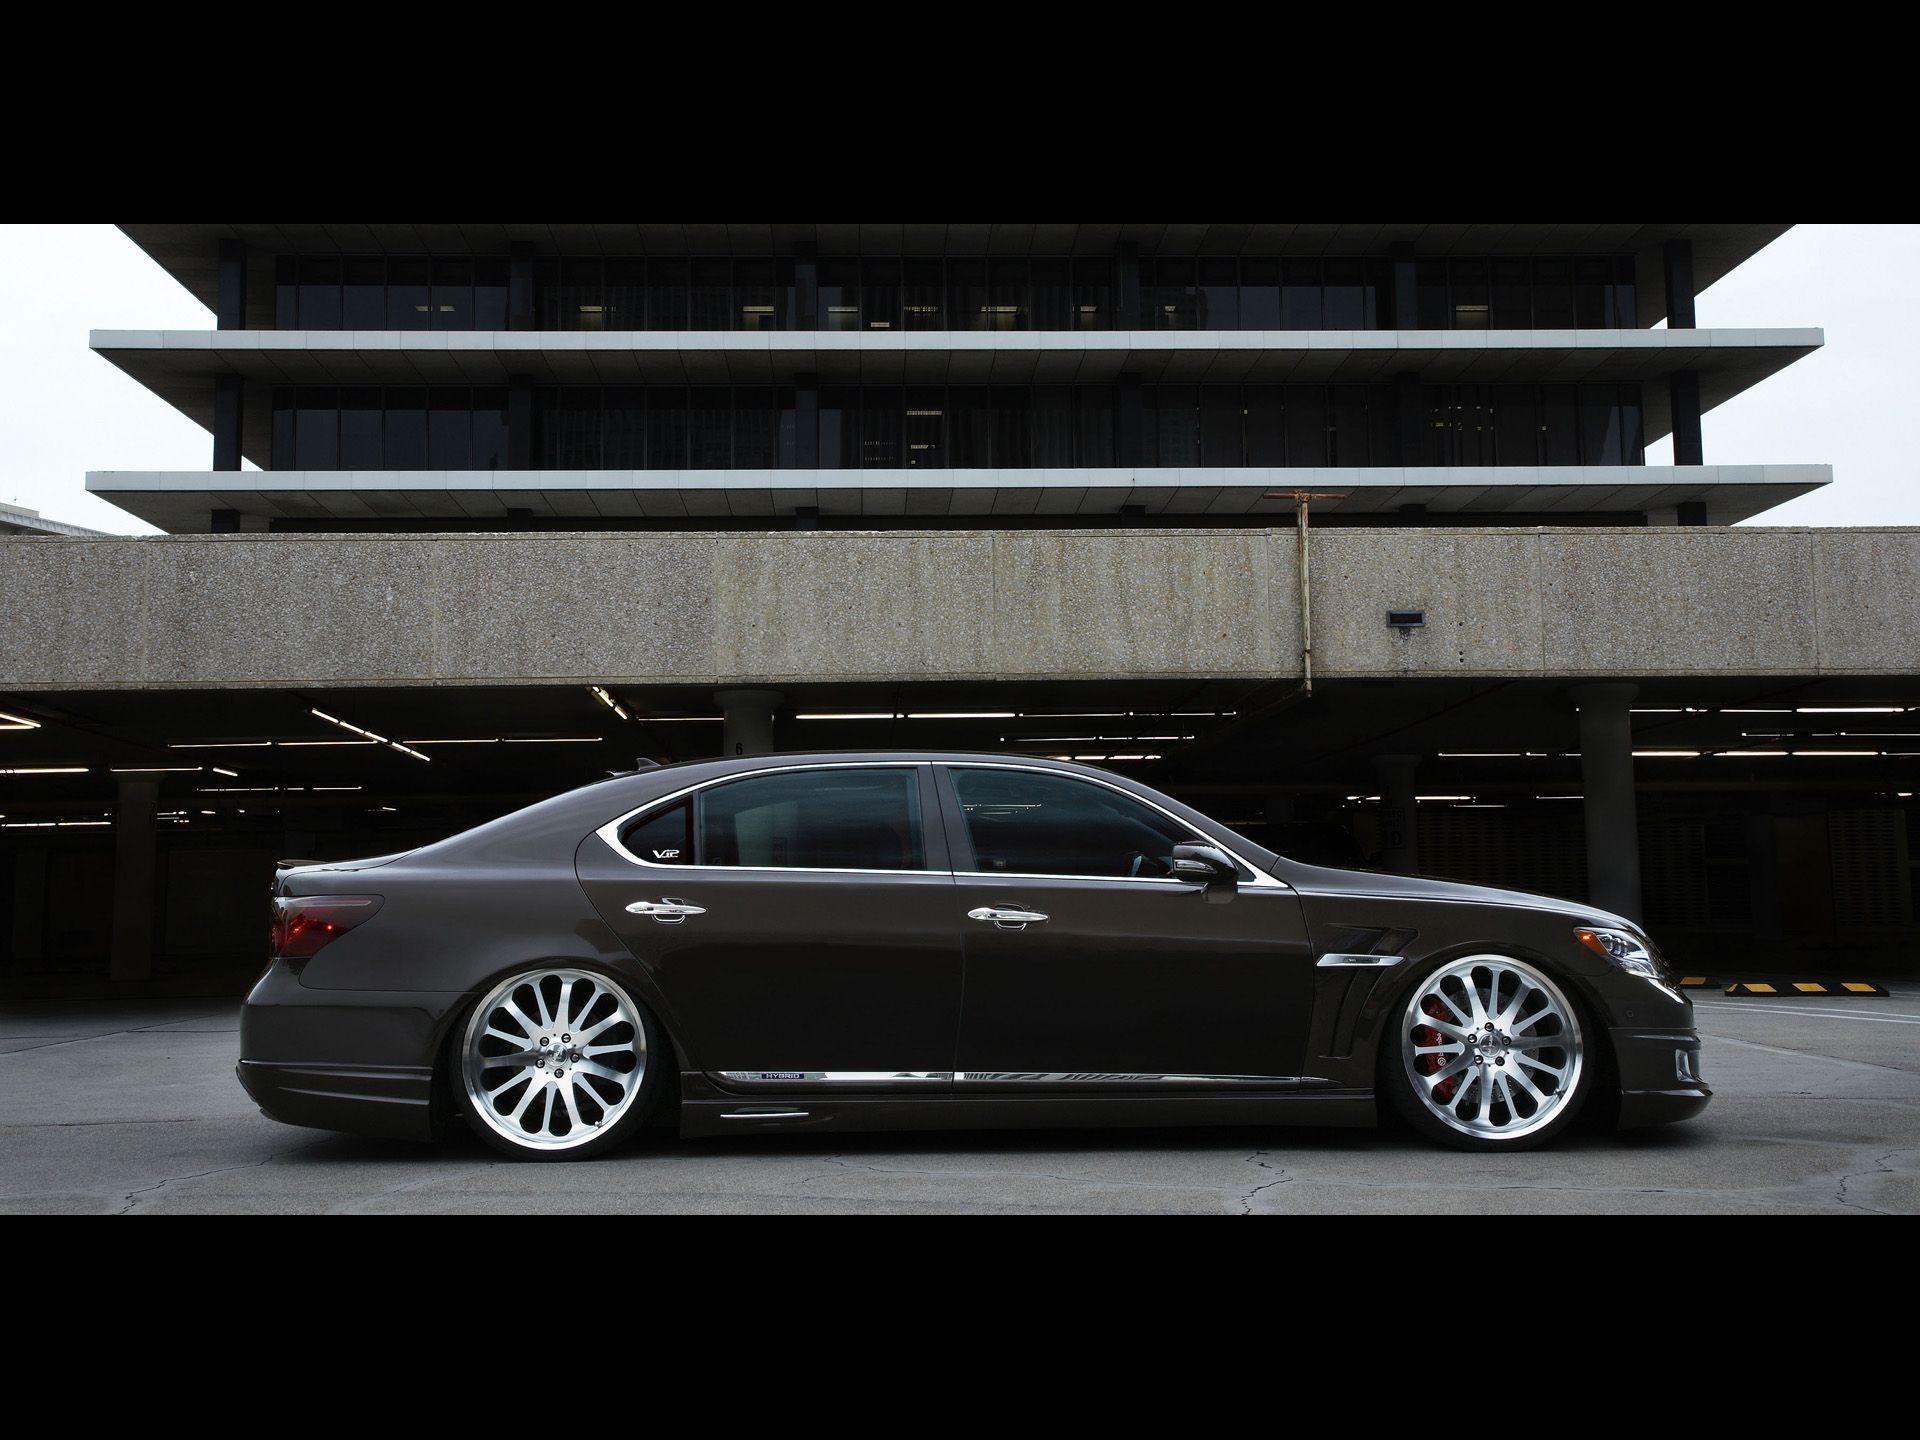 Lexus car cars hd wallpapers 2010 lexus ls 600h l by vip auto salon